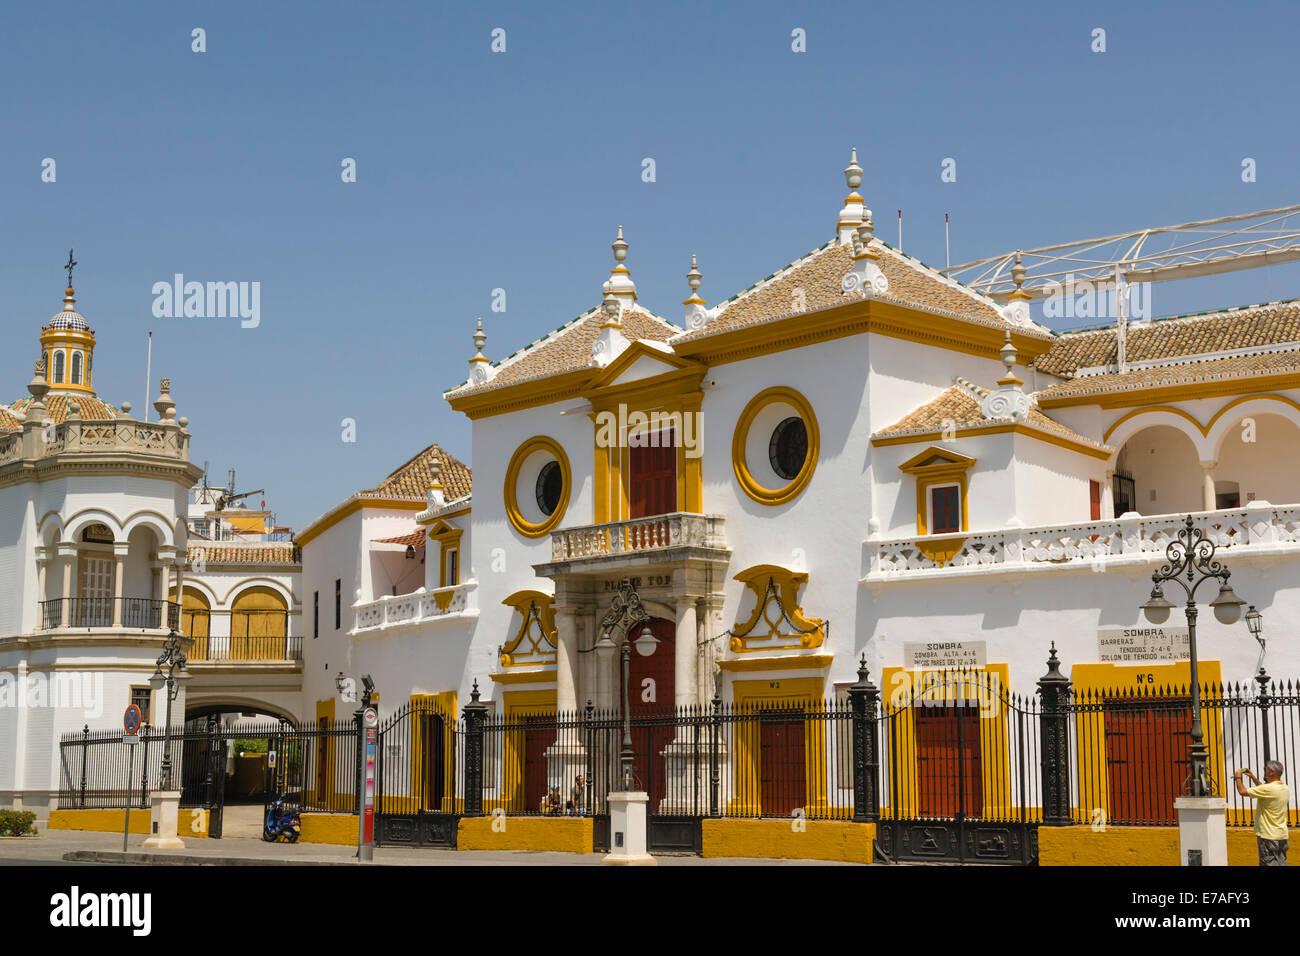 Plaza de Toros de la Real Maestranza de Caballeria de Sevilla, bullfighting ring, Paseo de Cristobal Colon, El Arenal, - Stock Image